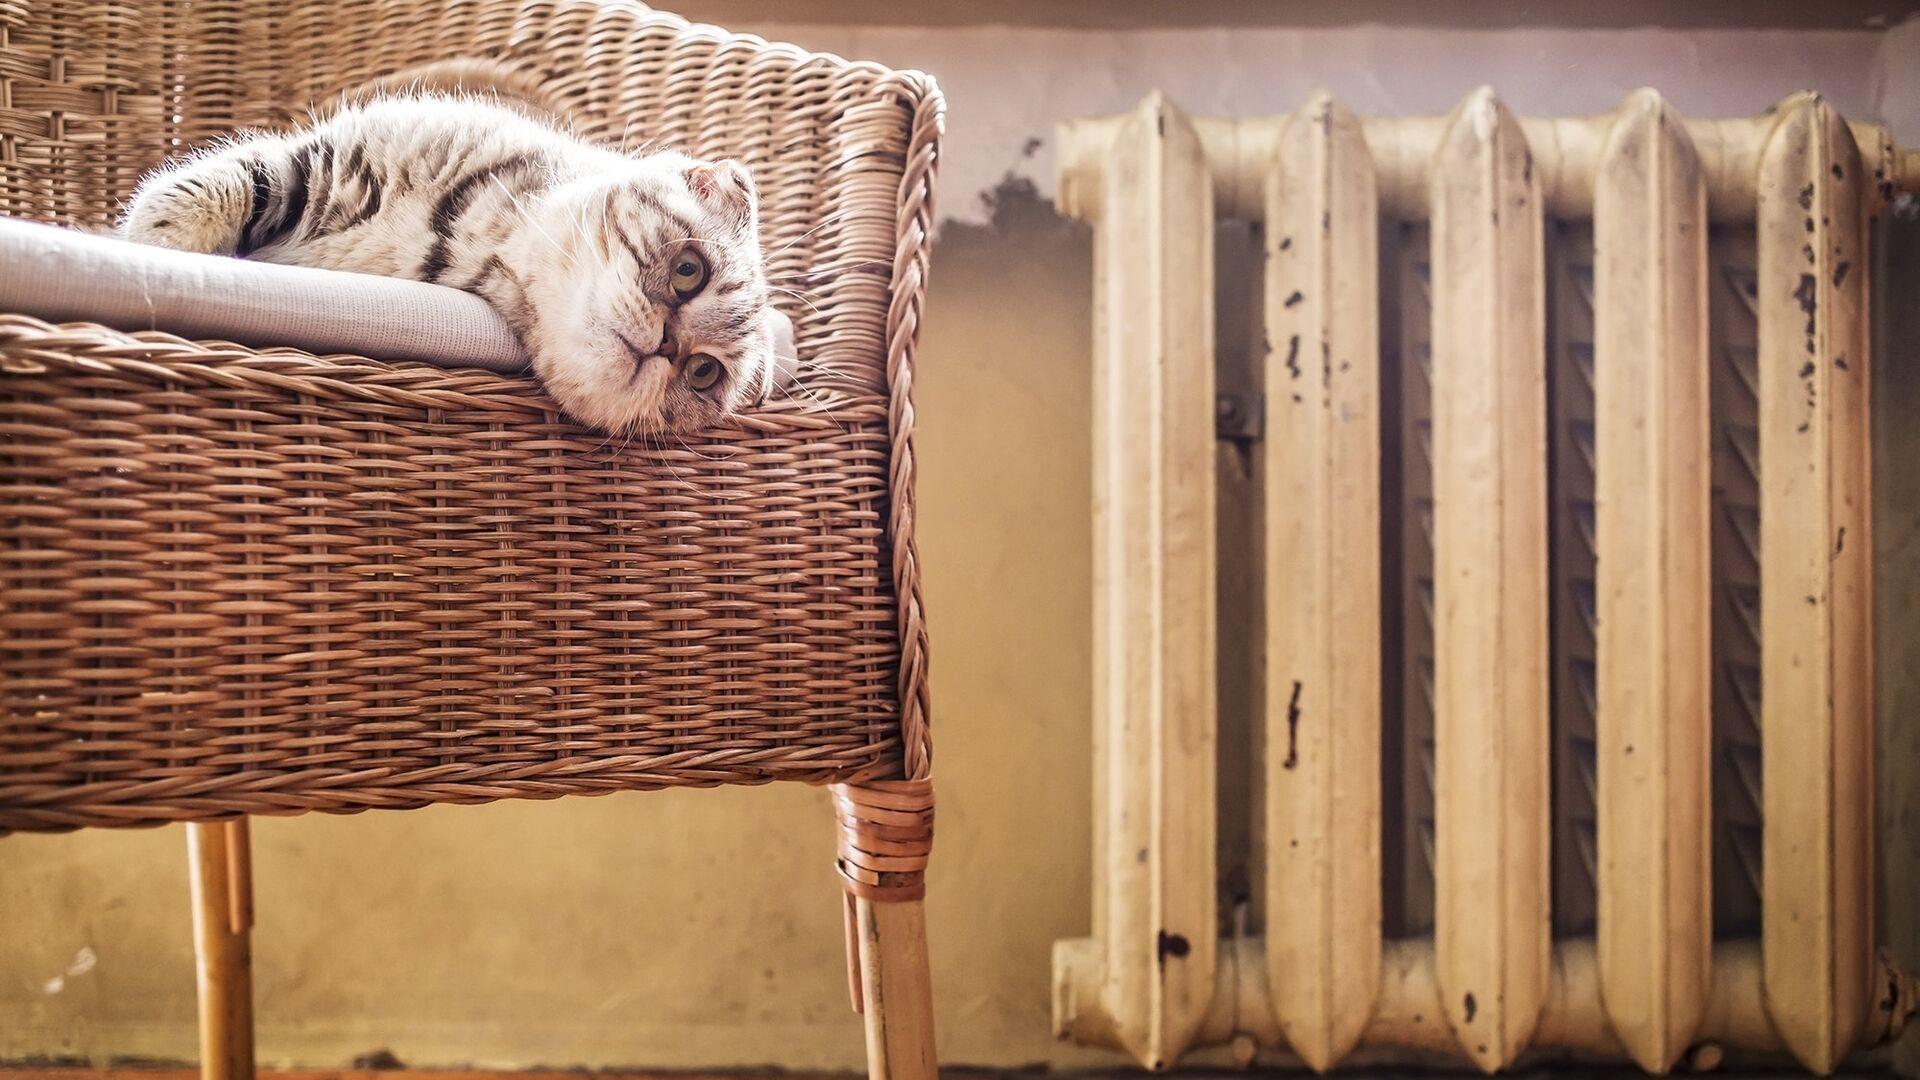 Кот в кресле у батареи - РИА Новости, 1920, 03.06.2021